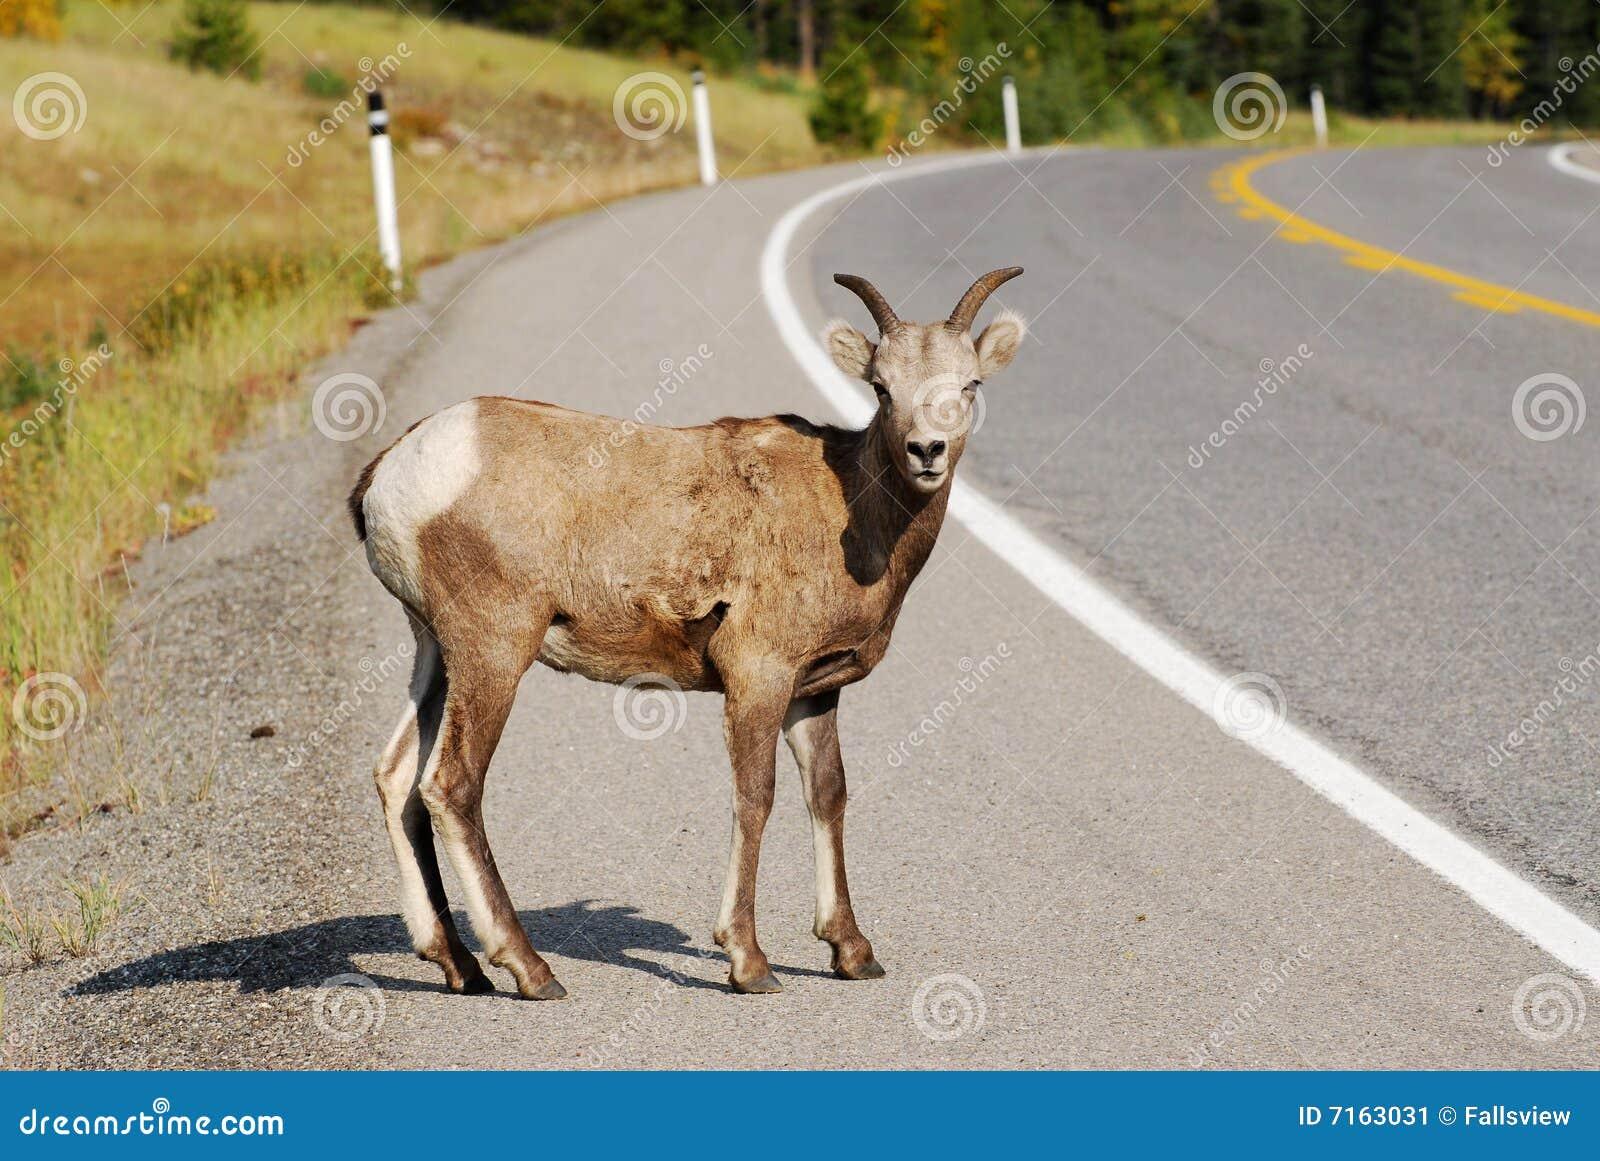 Big horn sheep crossing the highway, kananaskis country, alberta ...